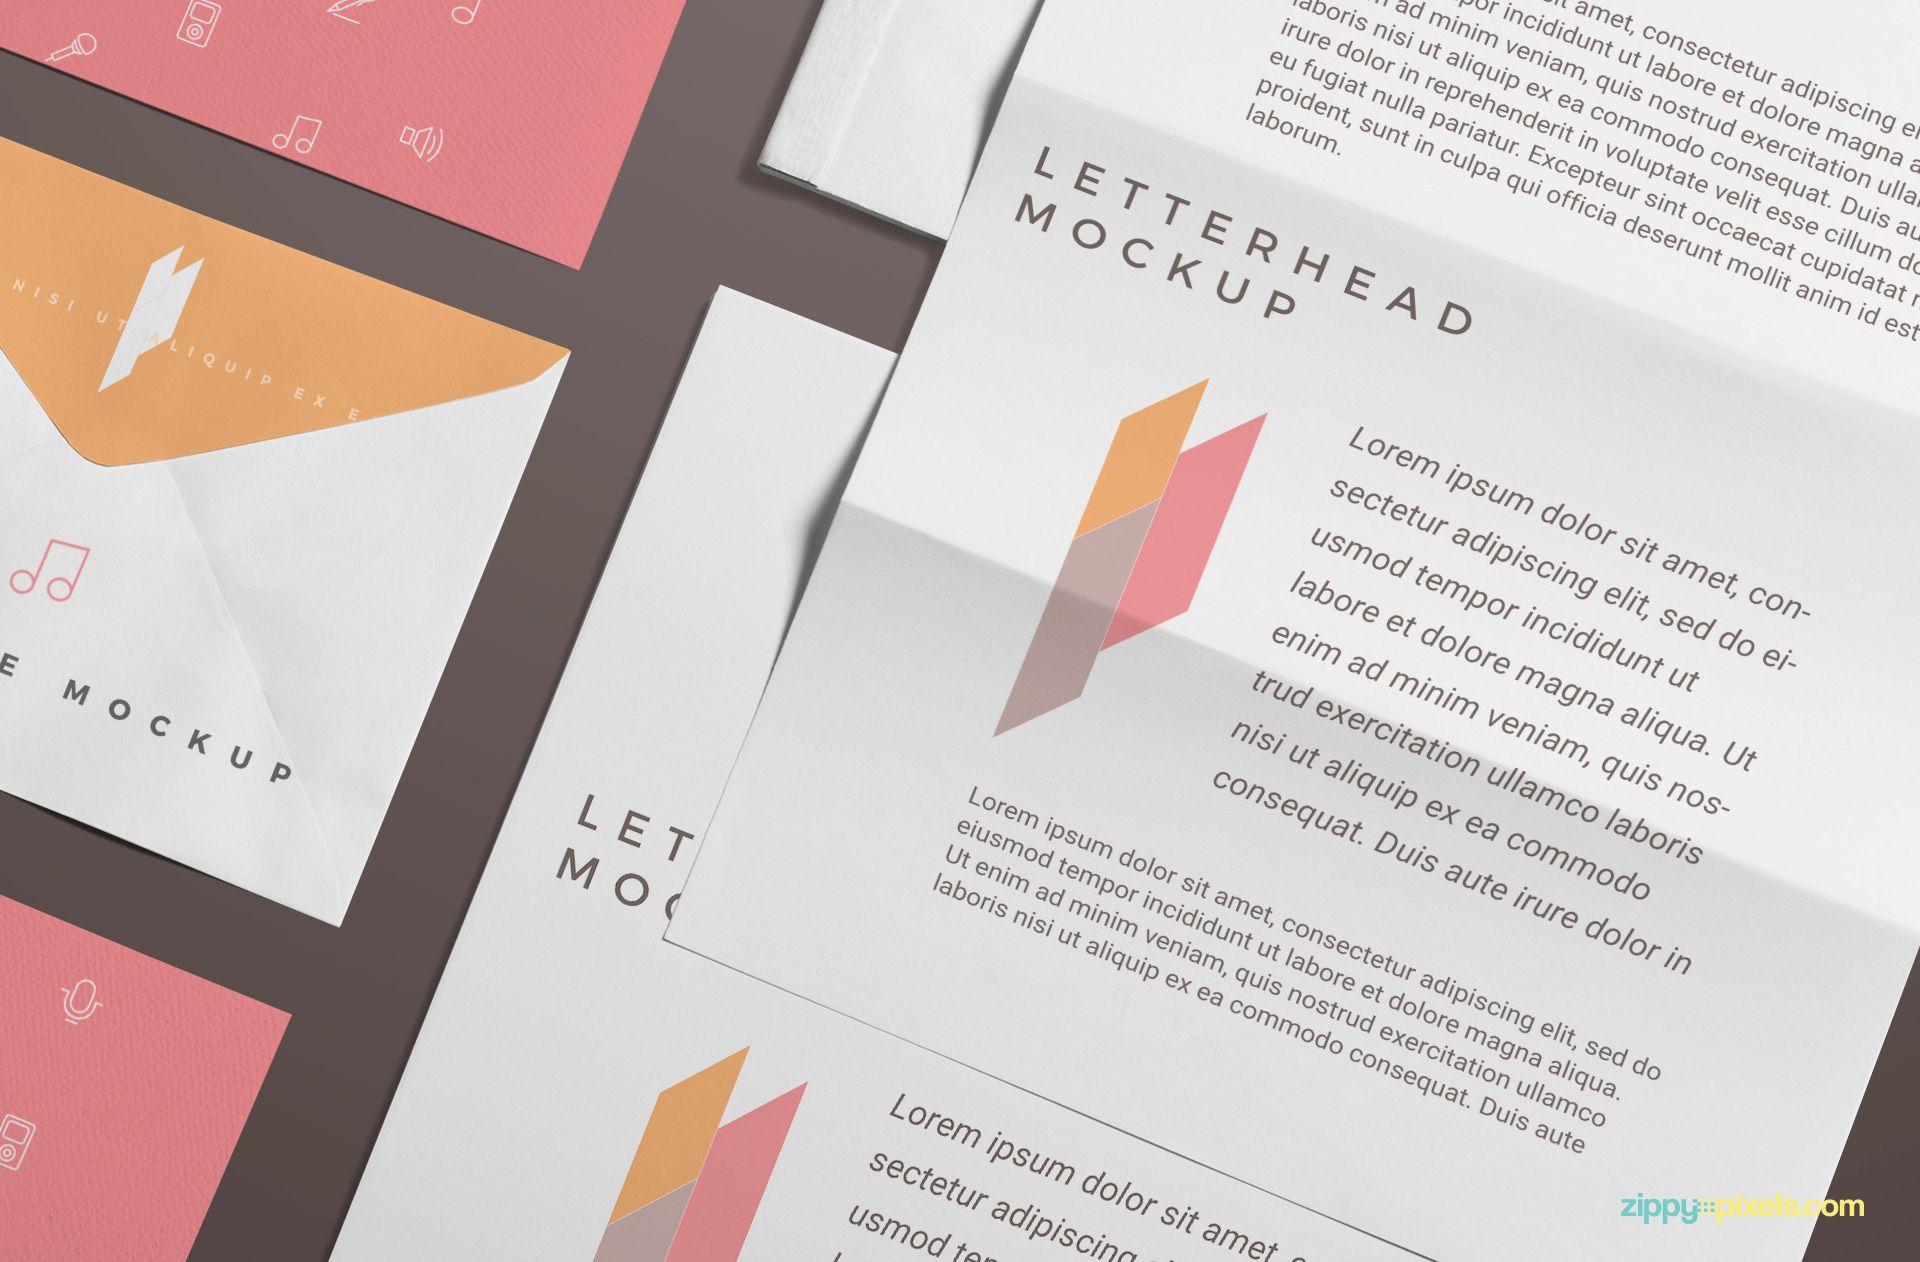 Free branding stationery mockup scene mockup free branding stationery mockup scene zippypixels reheart Choice Image